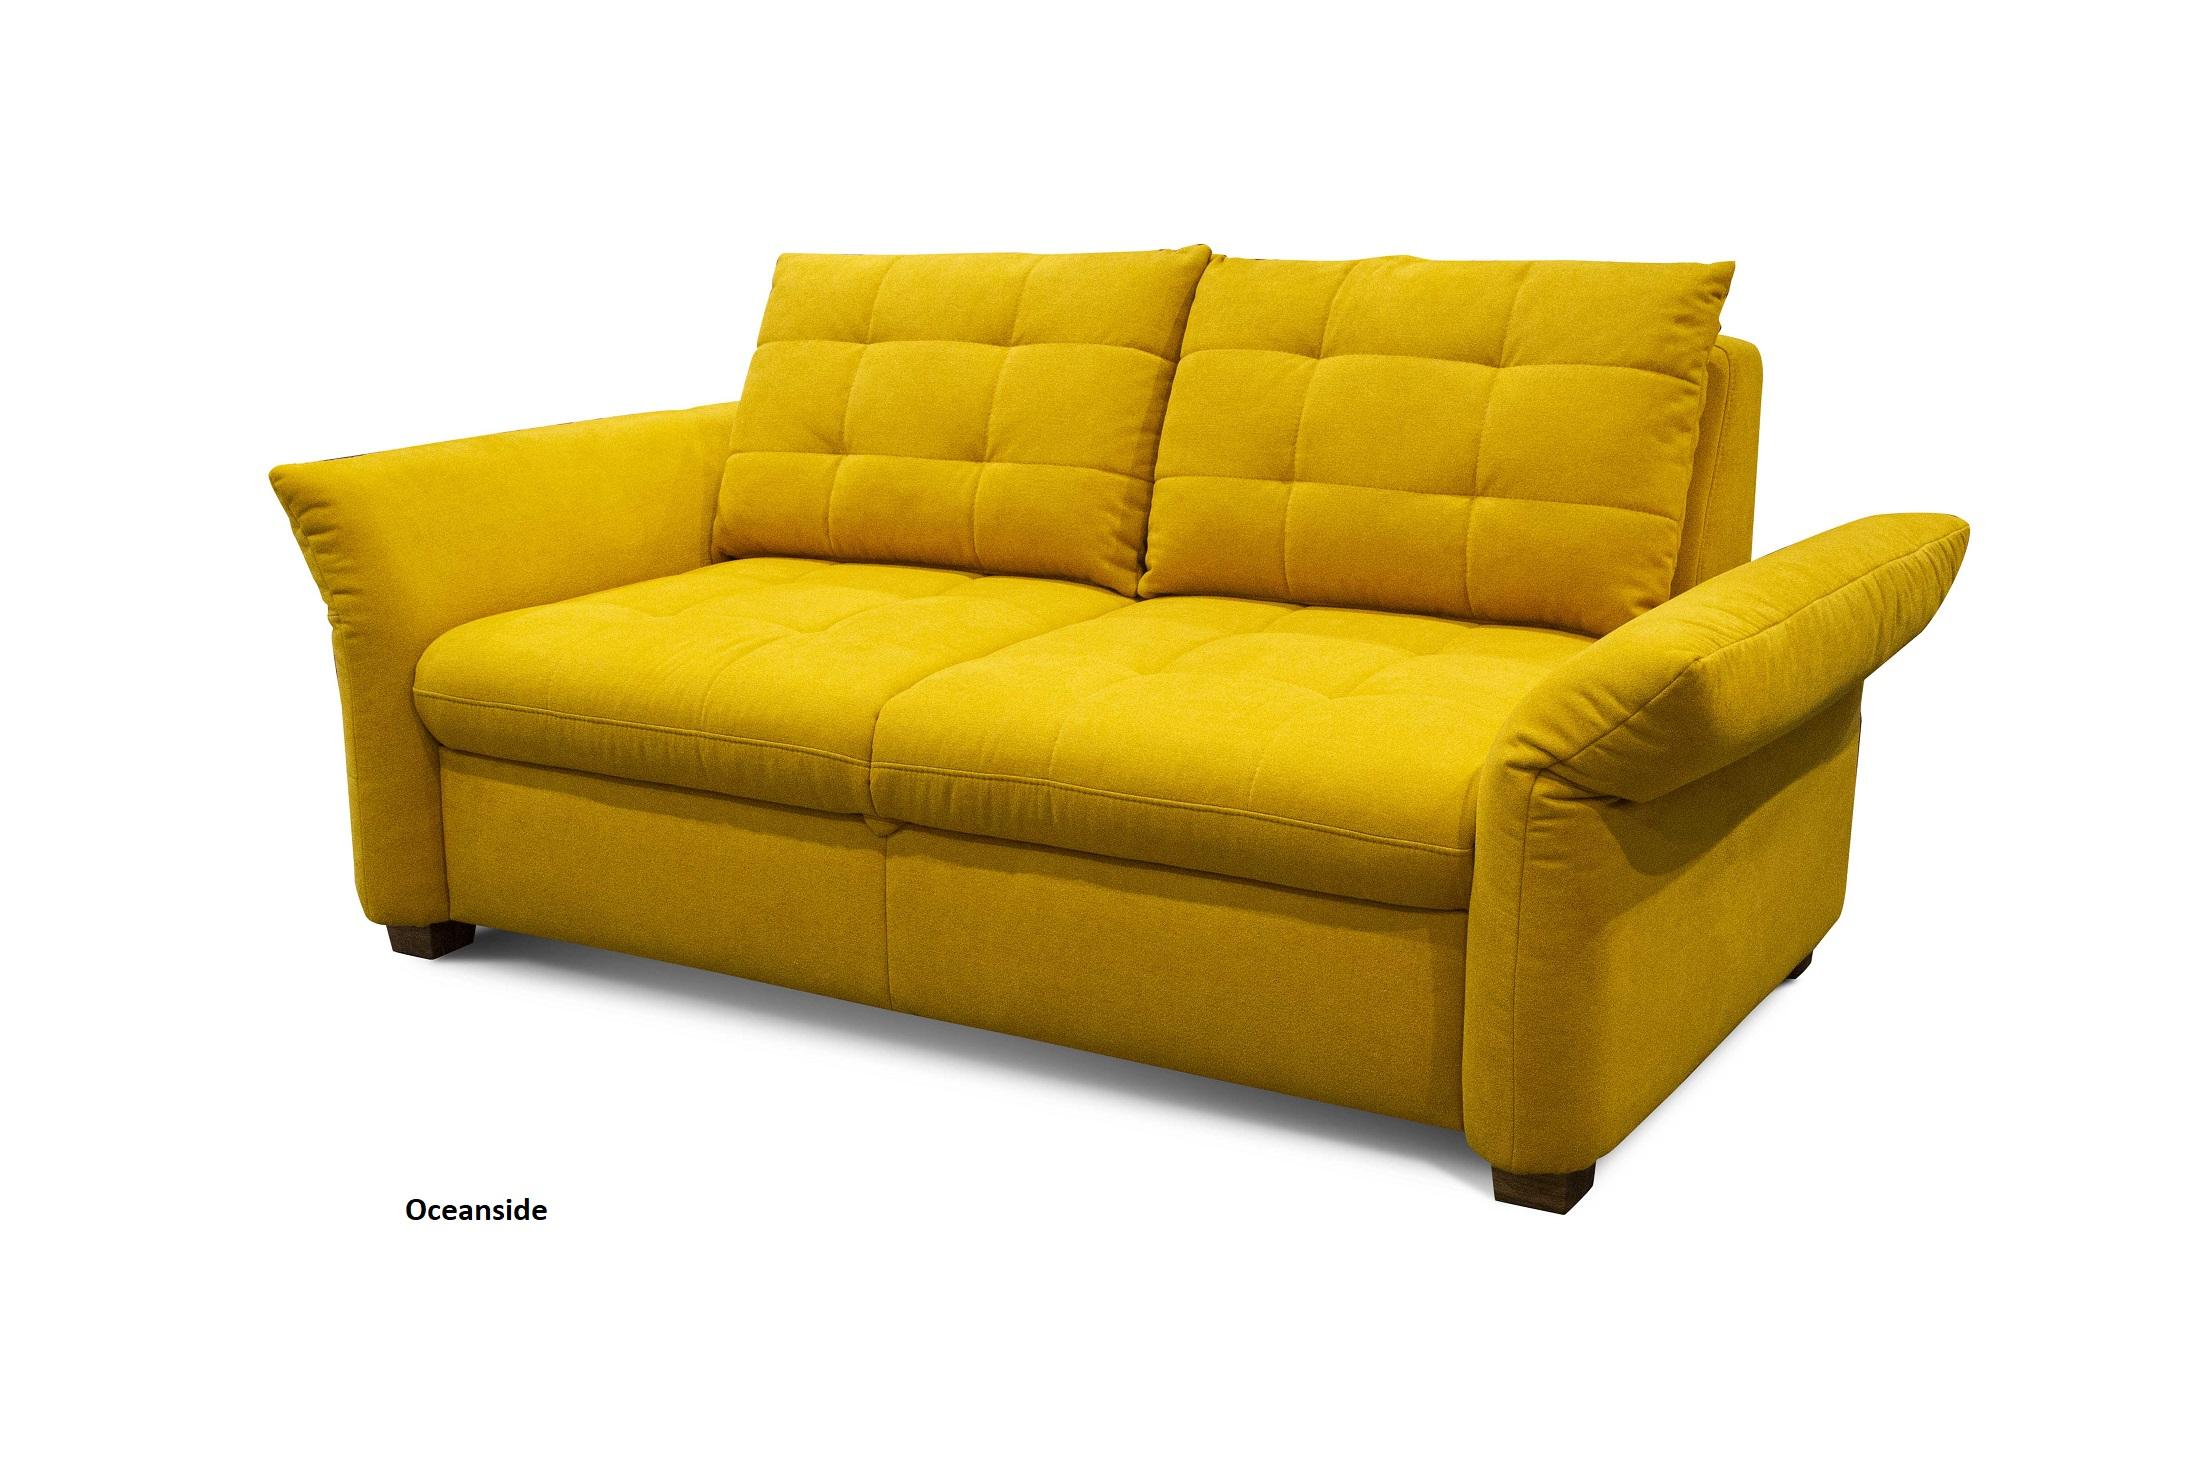 Full Size of Natura Sofa Gebraucht Couch Kansas Brooklyn Newport Pasadena Ligne Roset U Form Xxl Ektorp Echtleder Ebay Rahaus Sitzhöhe 55 Cm Günstig Kaufen Impressionen Sofa Natura Sofa